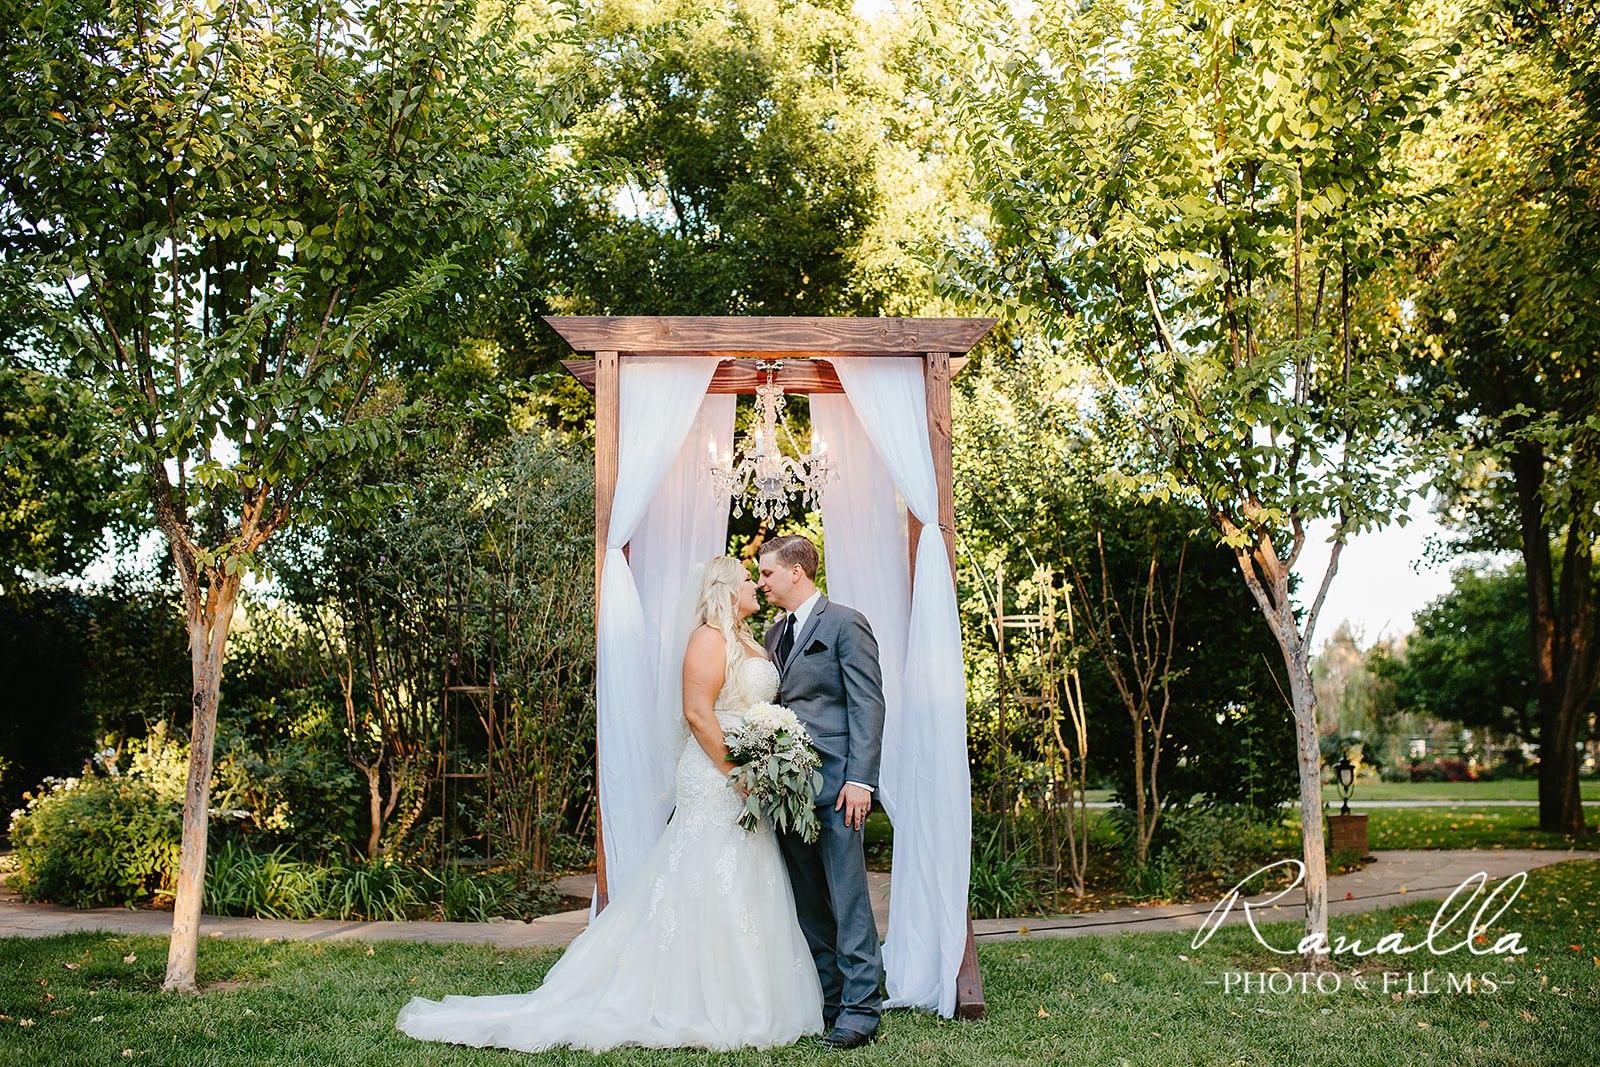 Taylor and Taylor Wedding-Ranalla Photo _ Films-845.jpg